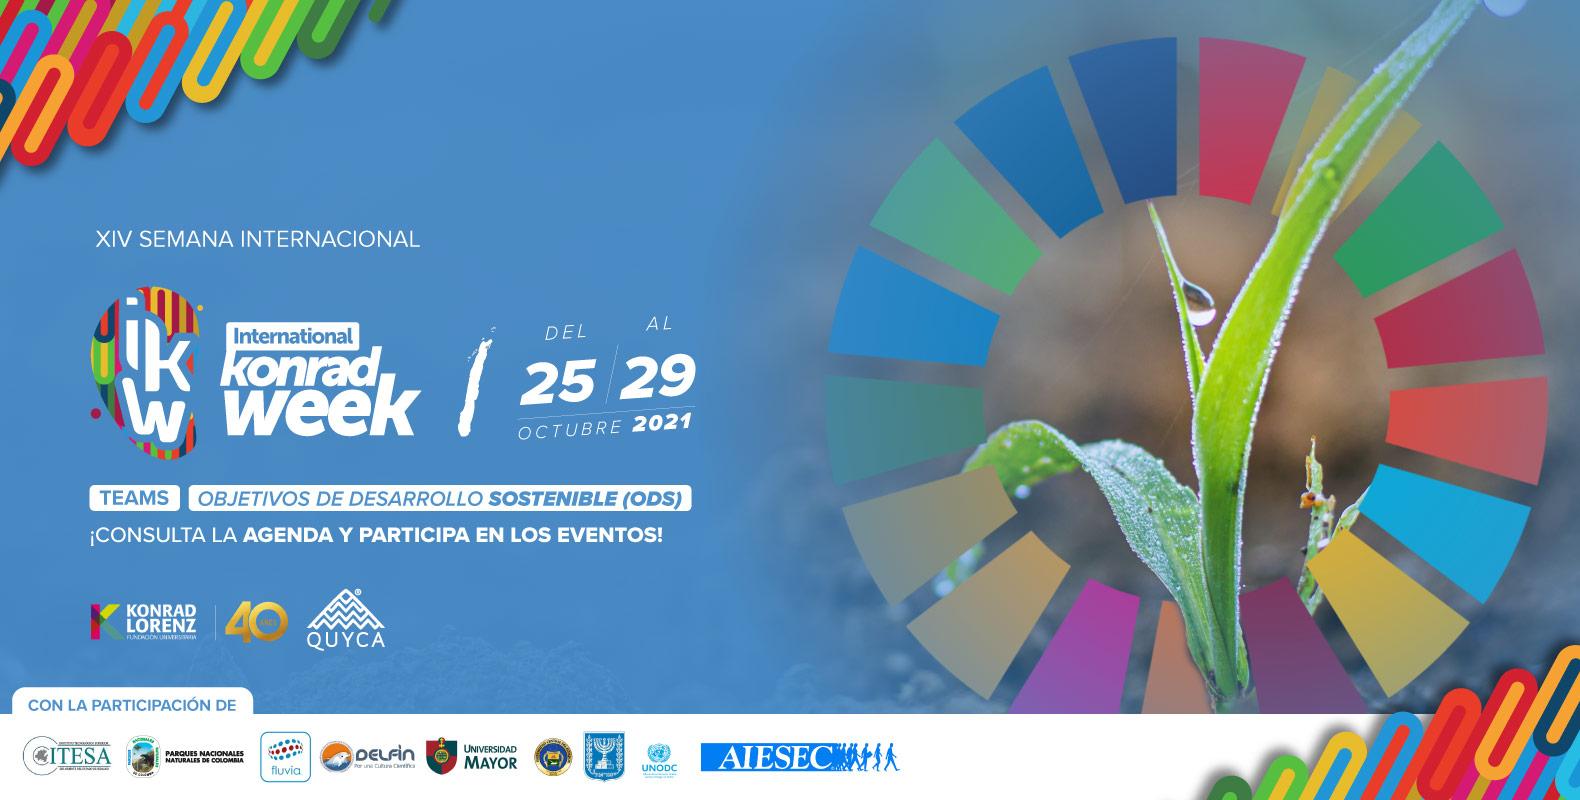 XIV Semana Internacional - International Konrad Week 2021 Objetivos de Desarrollo Sostenible (ODS)